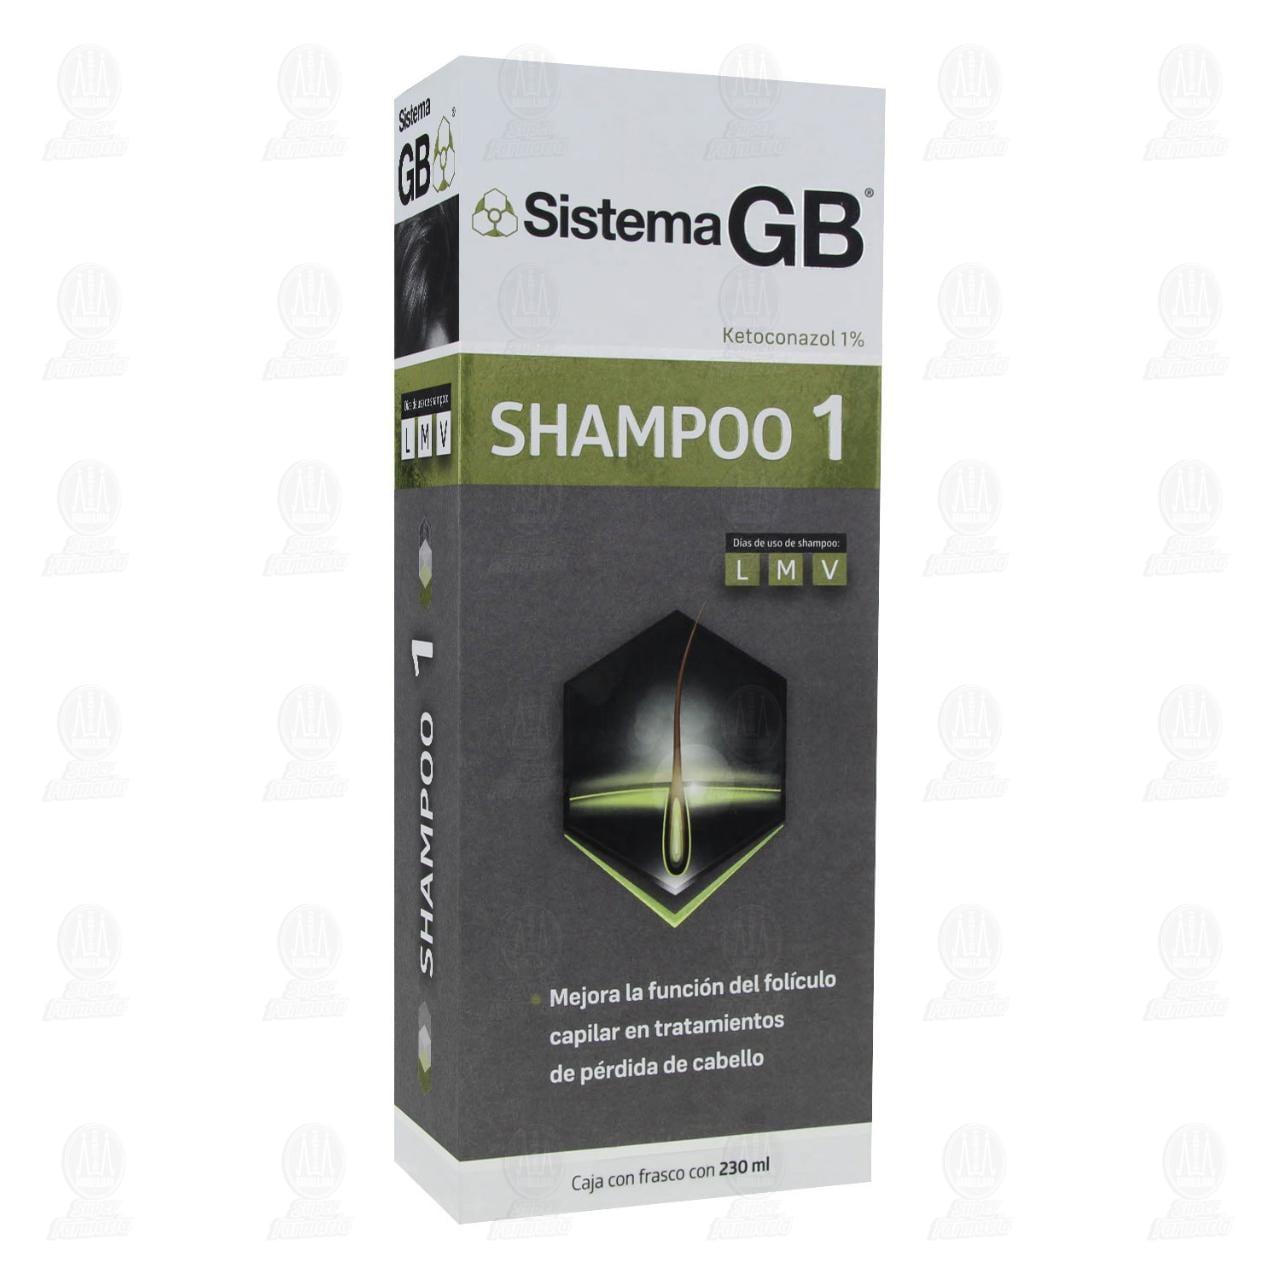 Comprar Sistema GB Shampoo 1, 230 ml. en Farmacias Guadalajara